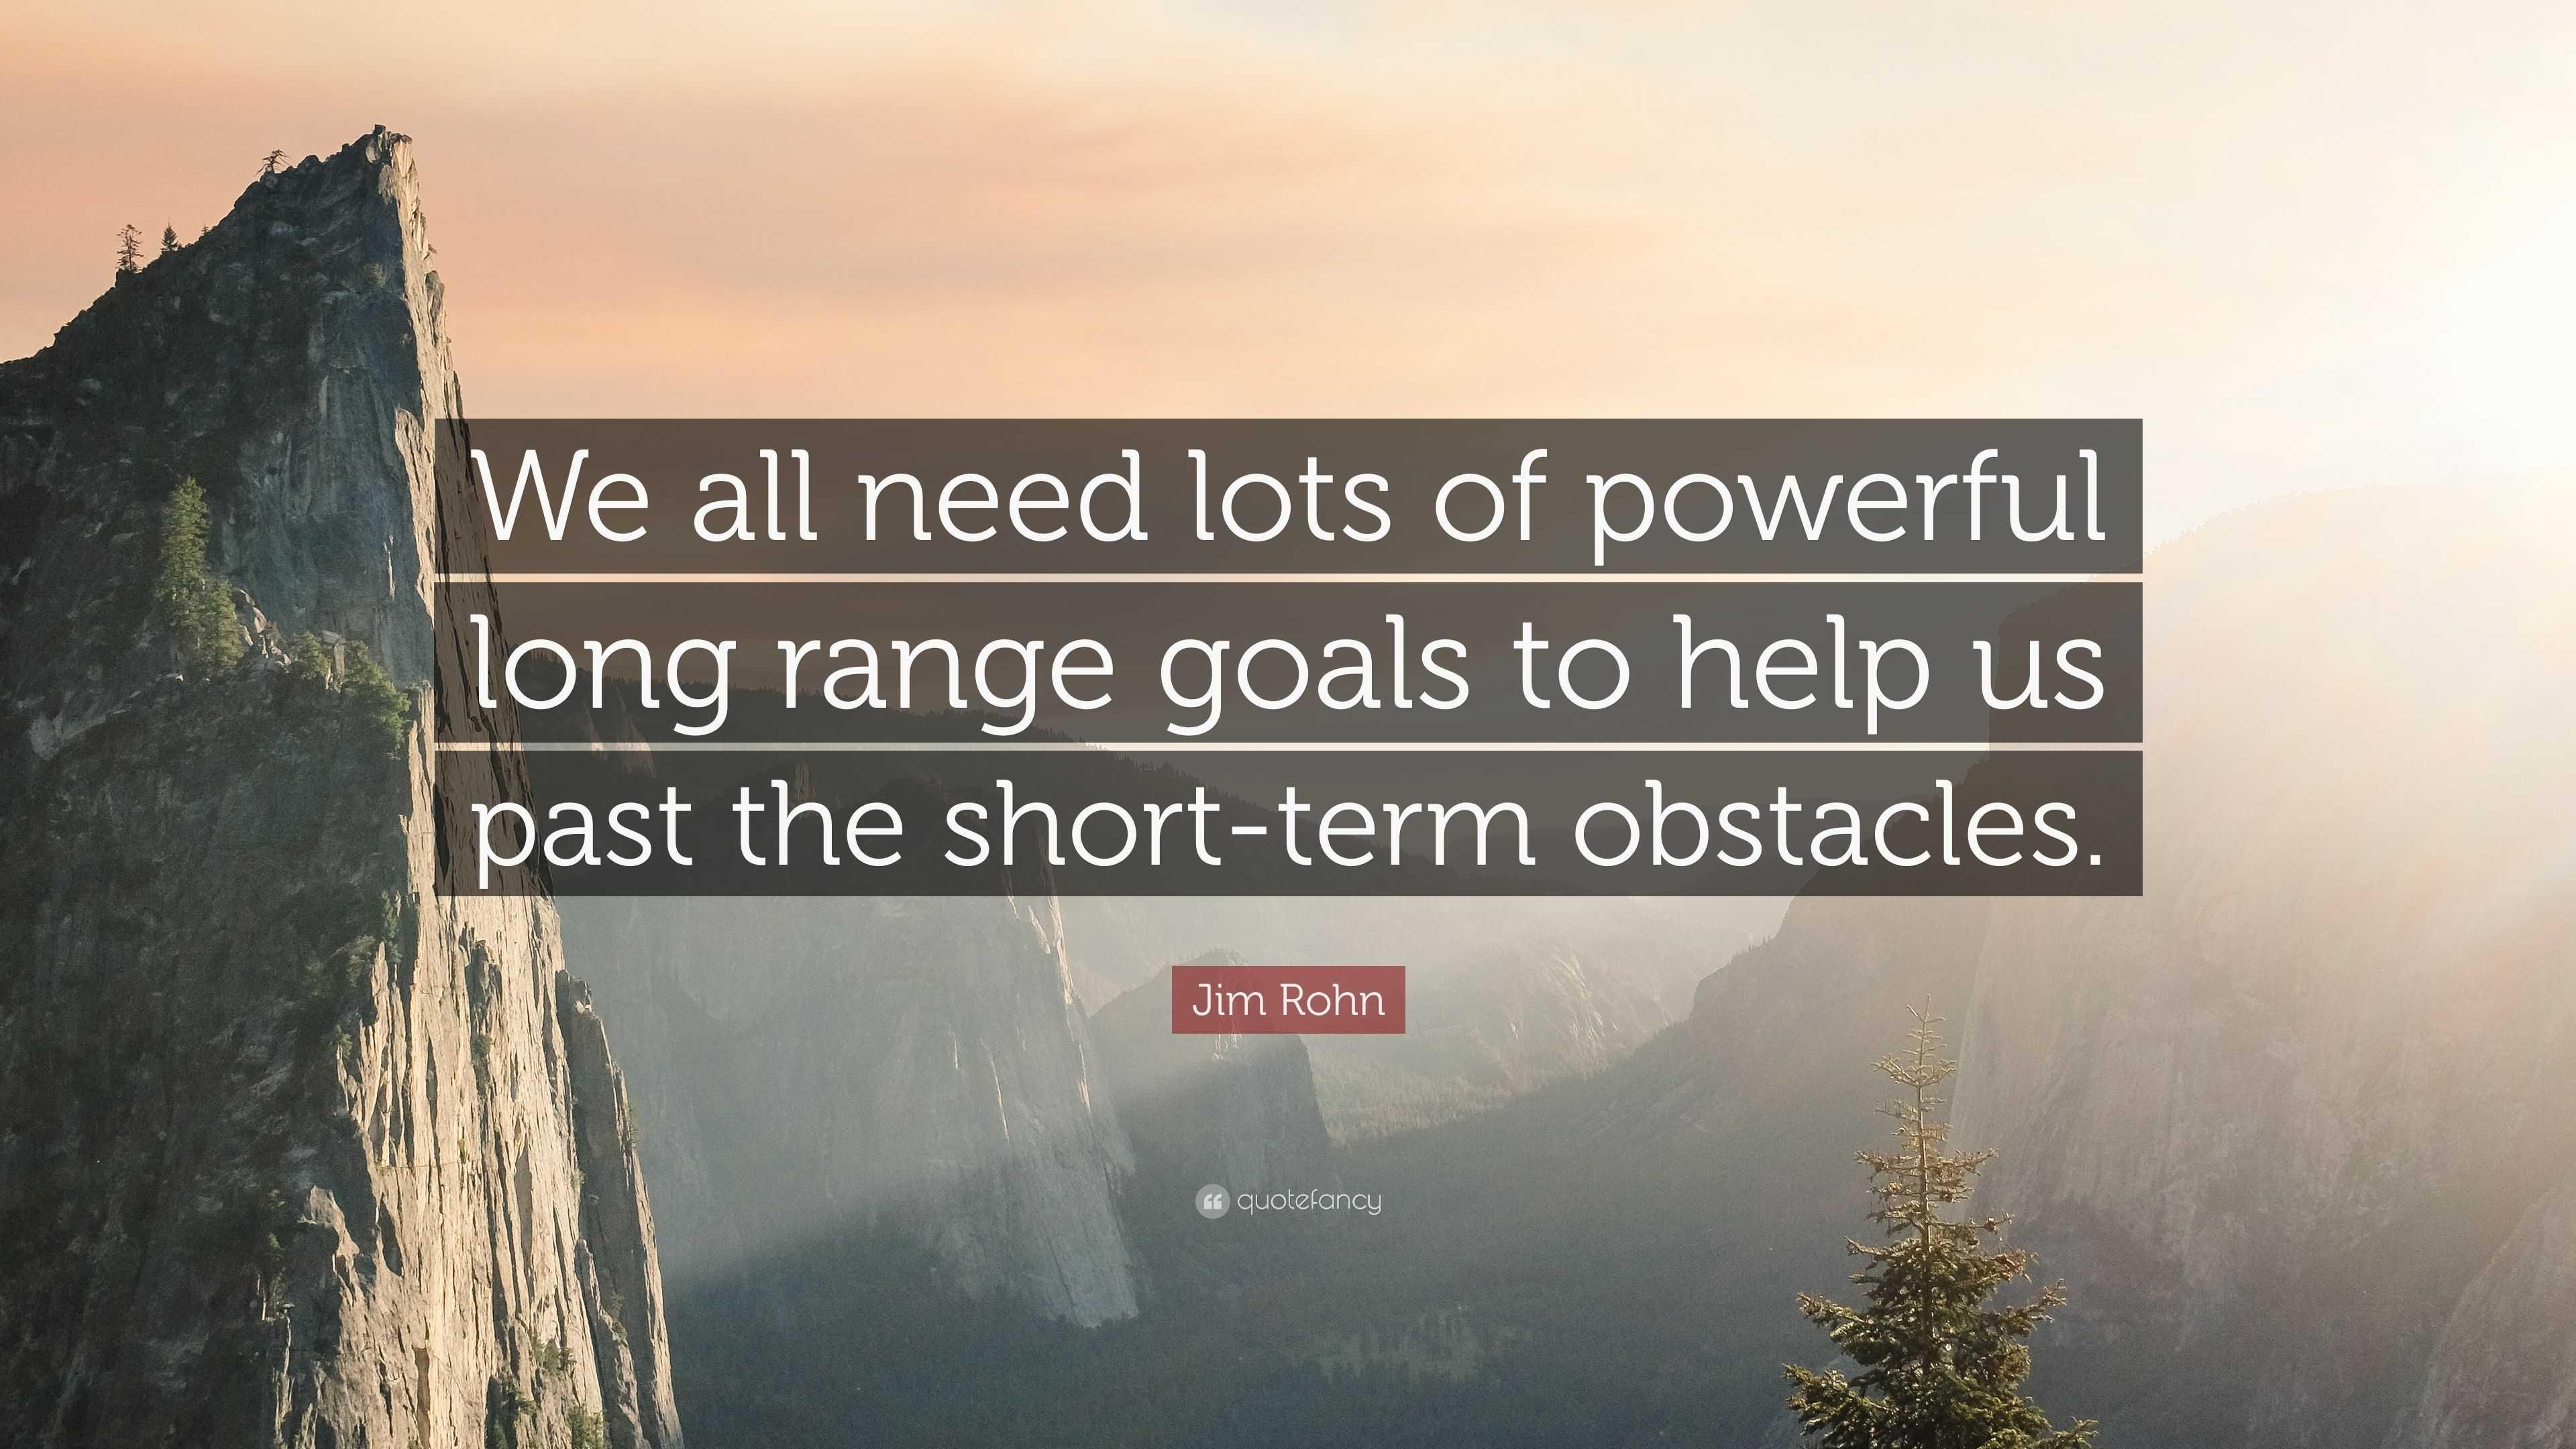 long range goals 3 essay Free setting goals papers, essays implementing a set of long-range goals an application essay - 3.